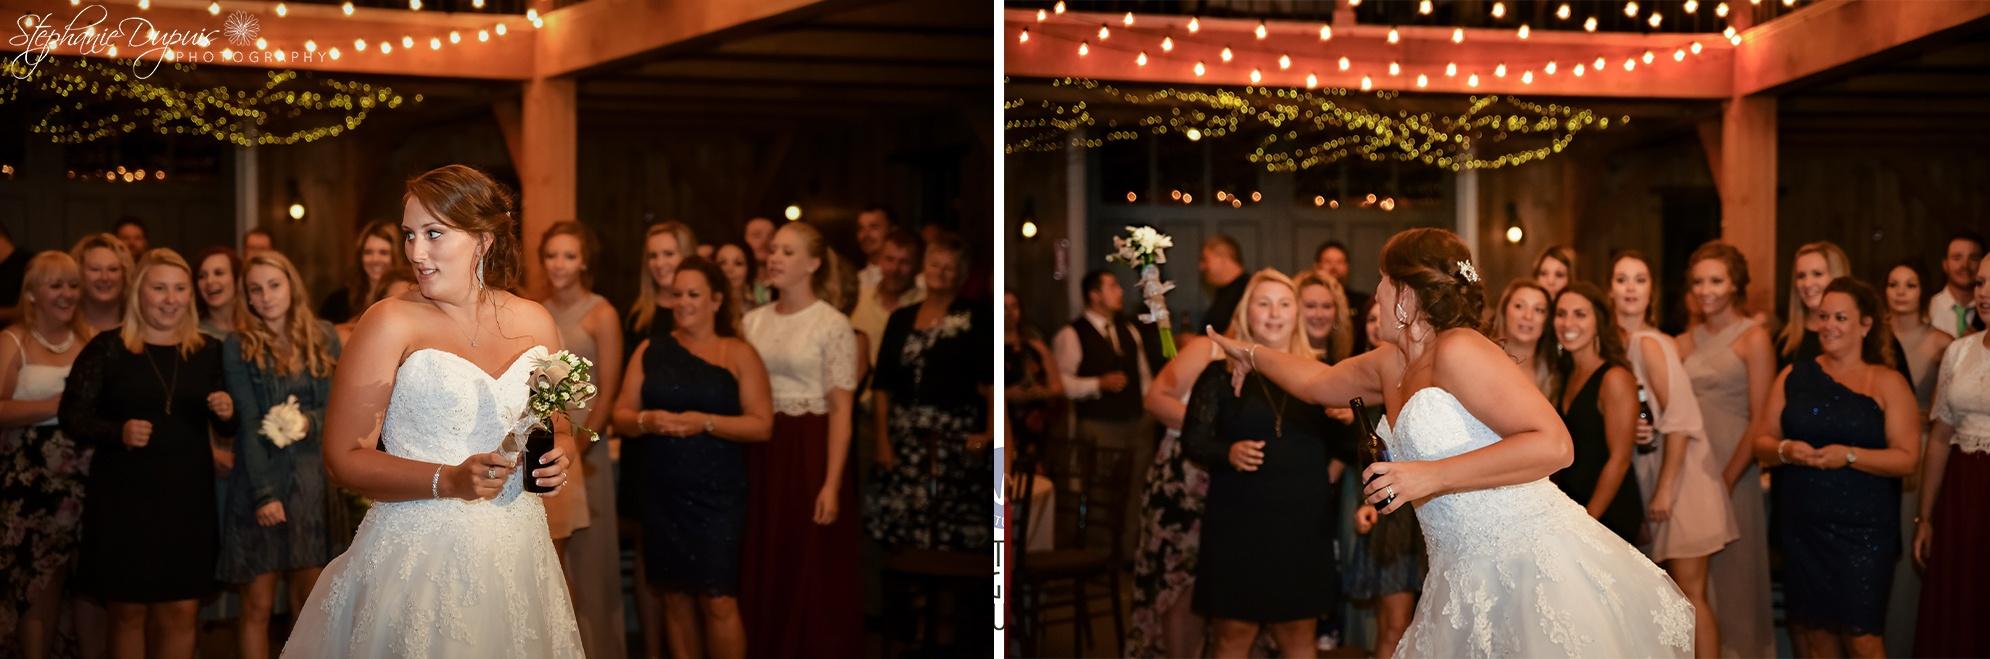 Whitefield Wedding Photographer 05 3 - Portfolio: Nason Wedding